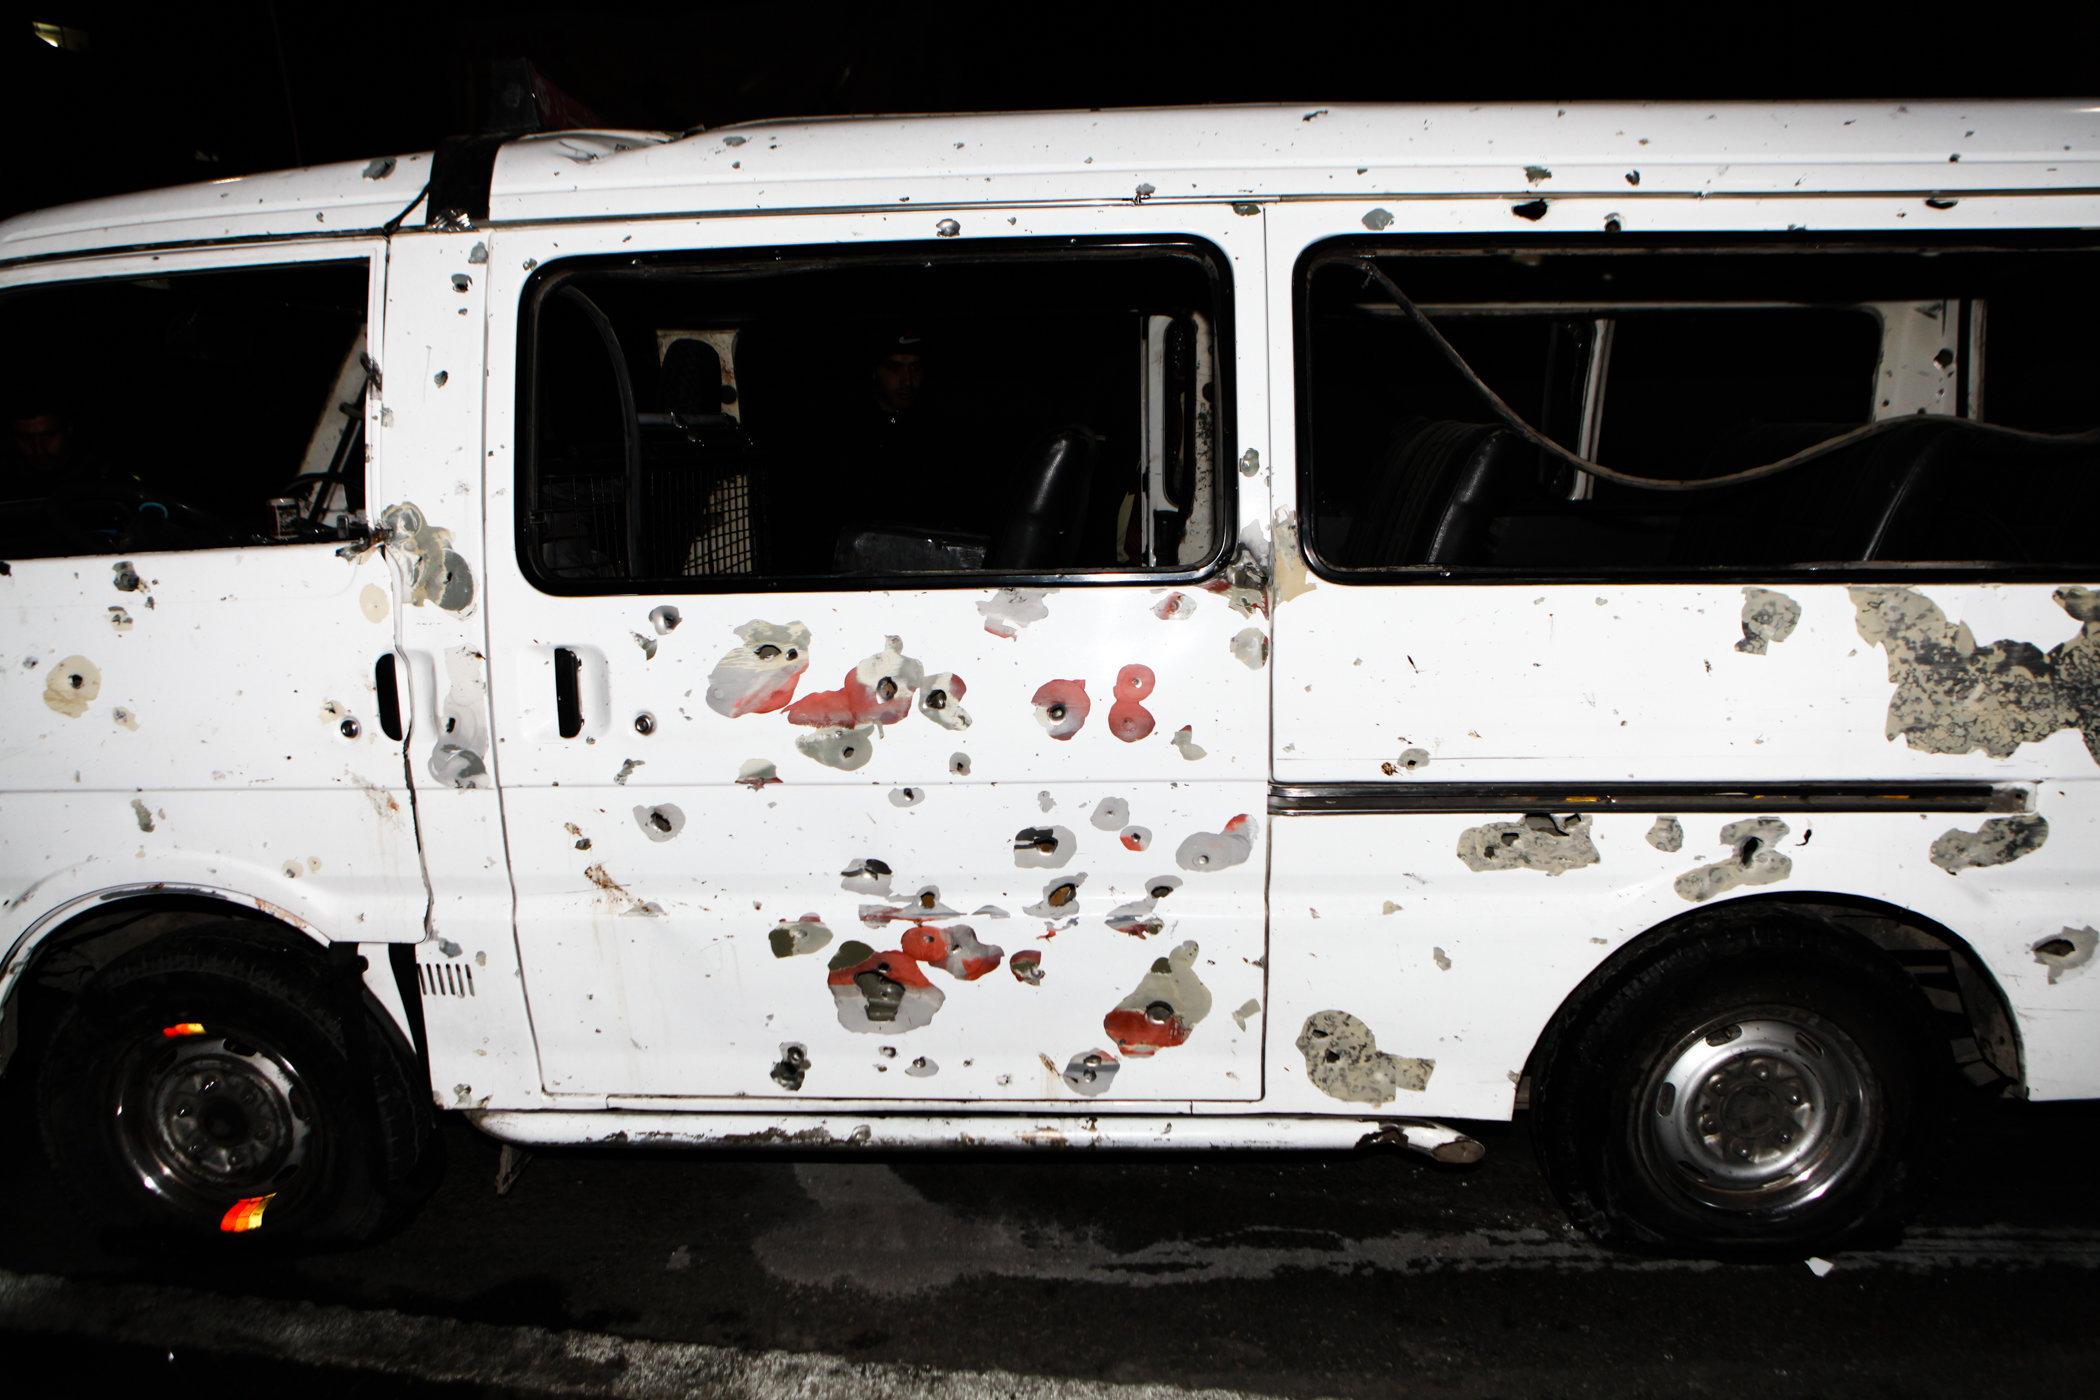 syria2011-0924-编辑.jpg